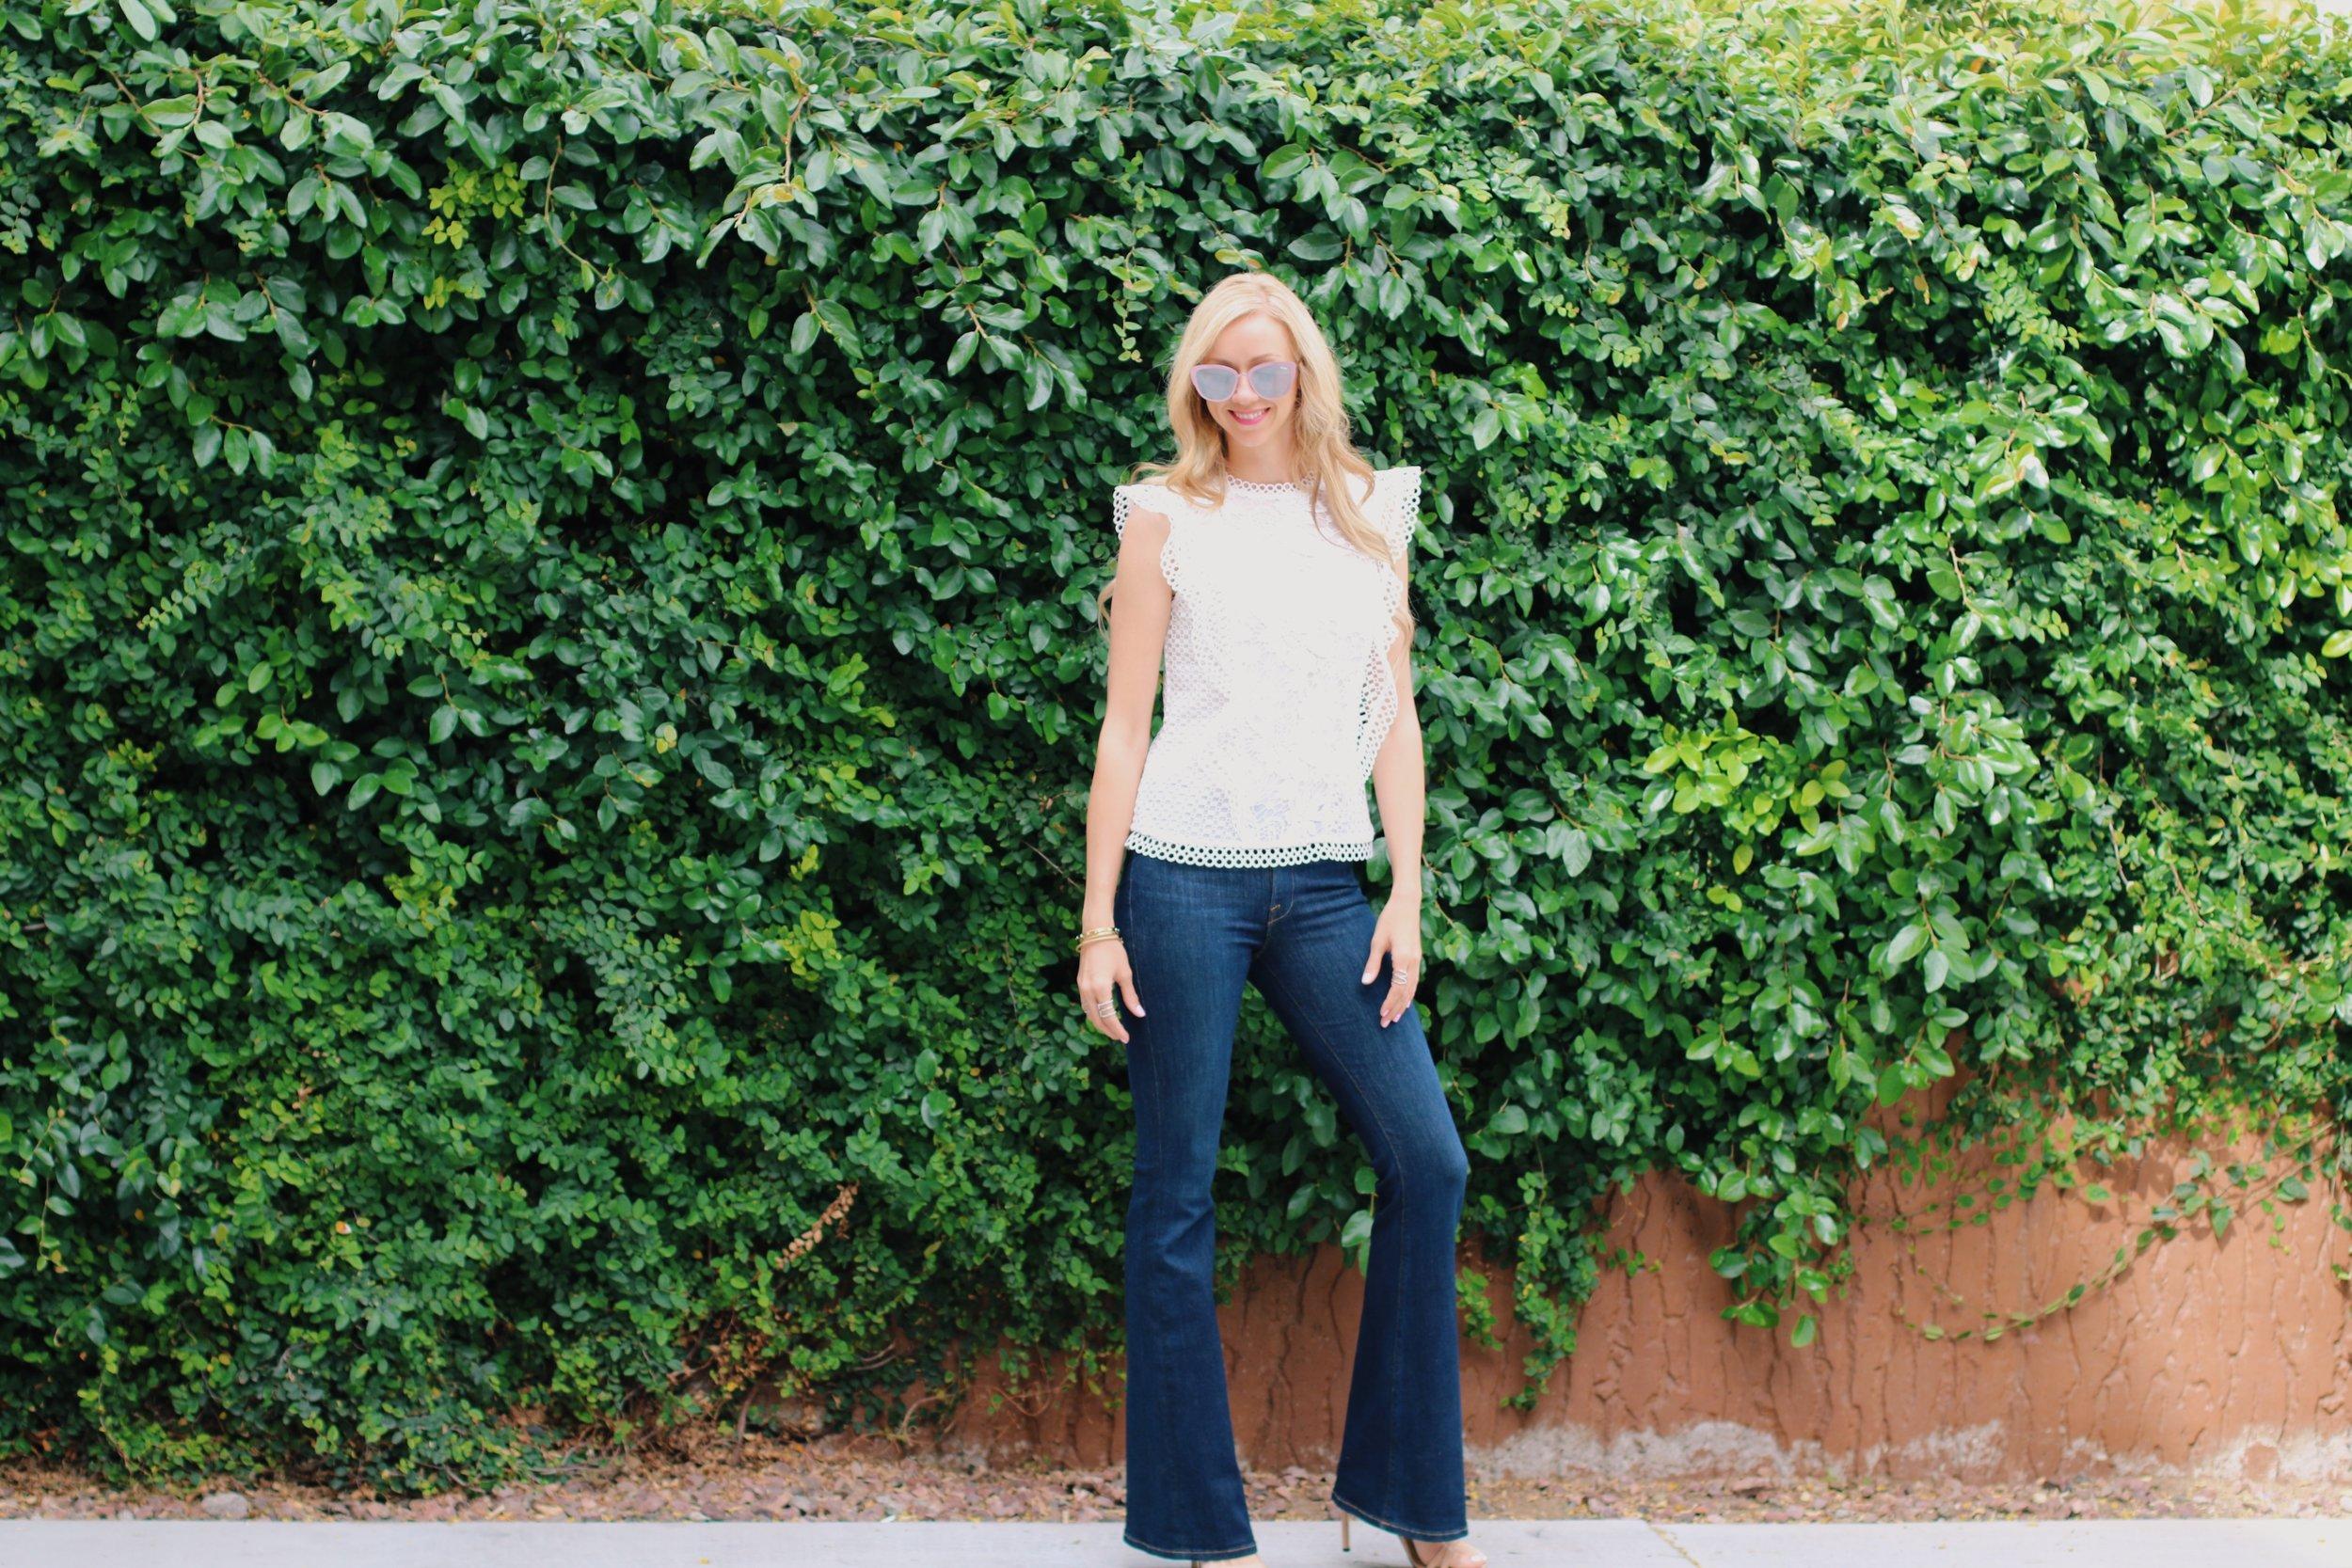 ted-baker-zania-top-white-lace-flutter-sleeve.jpg